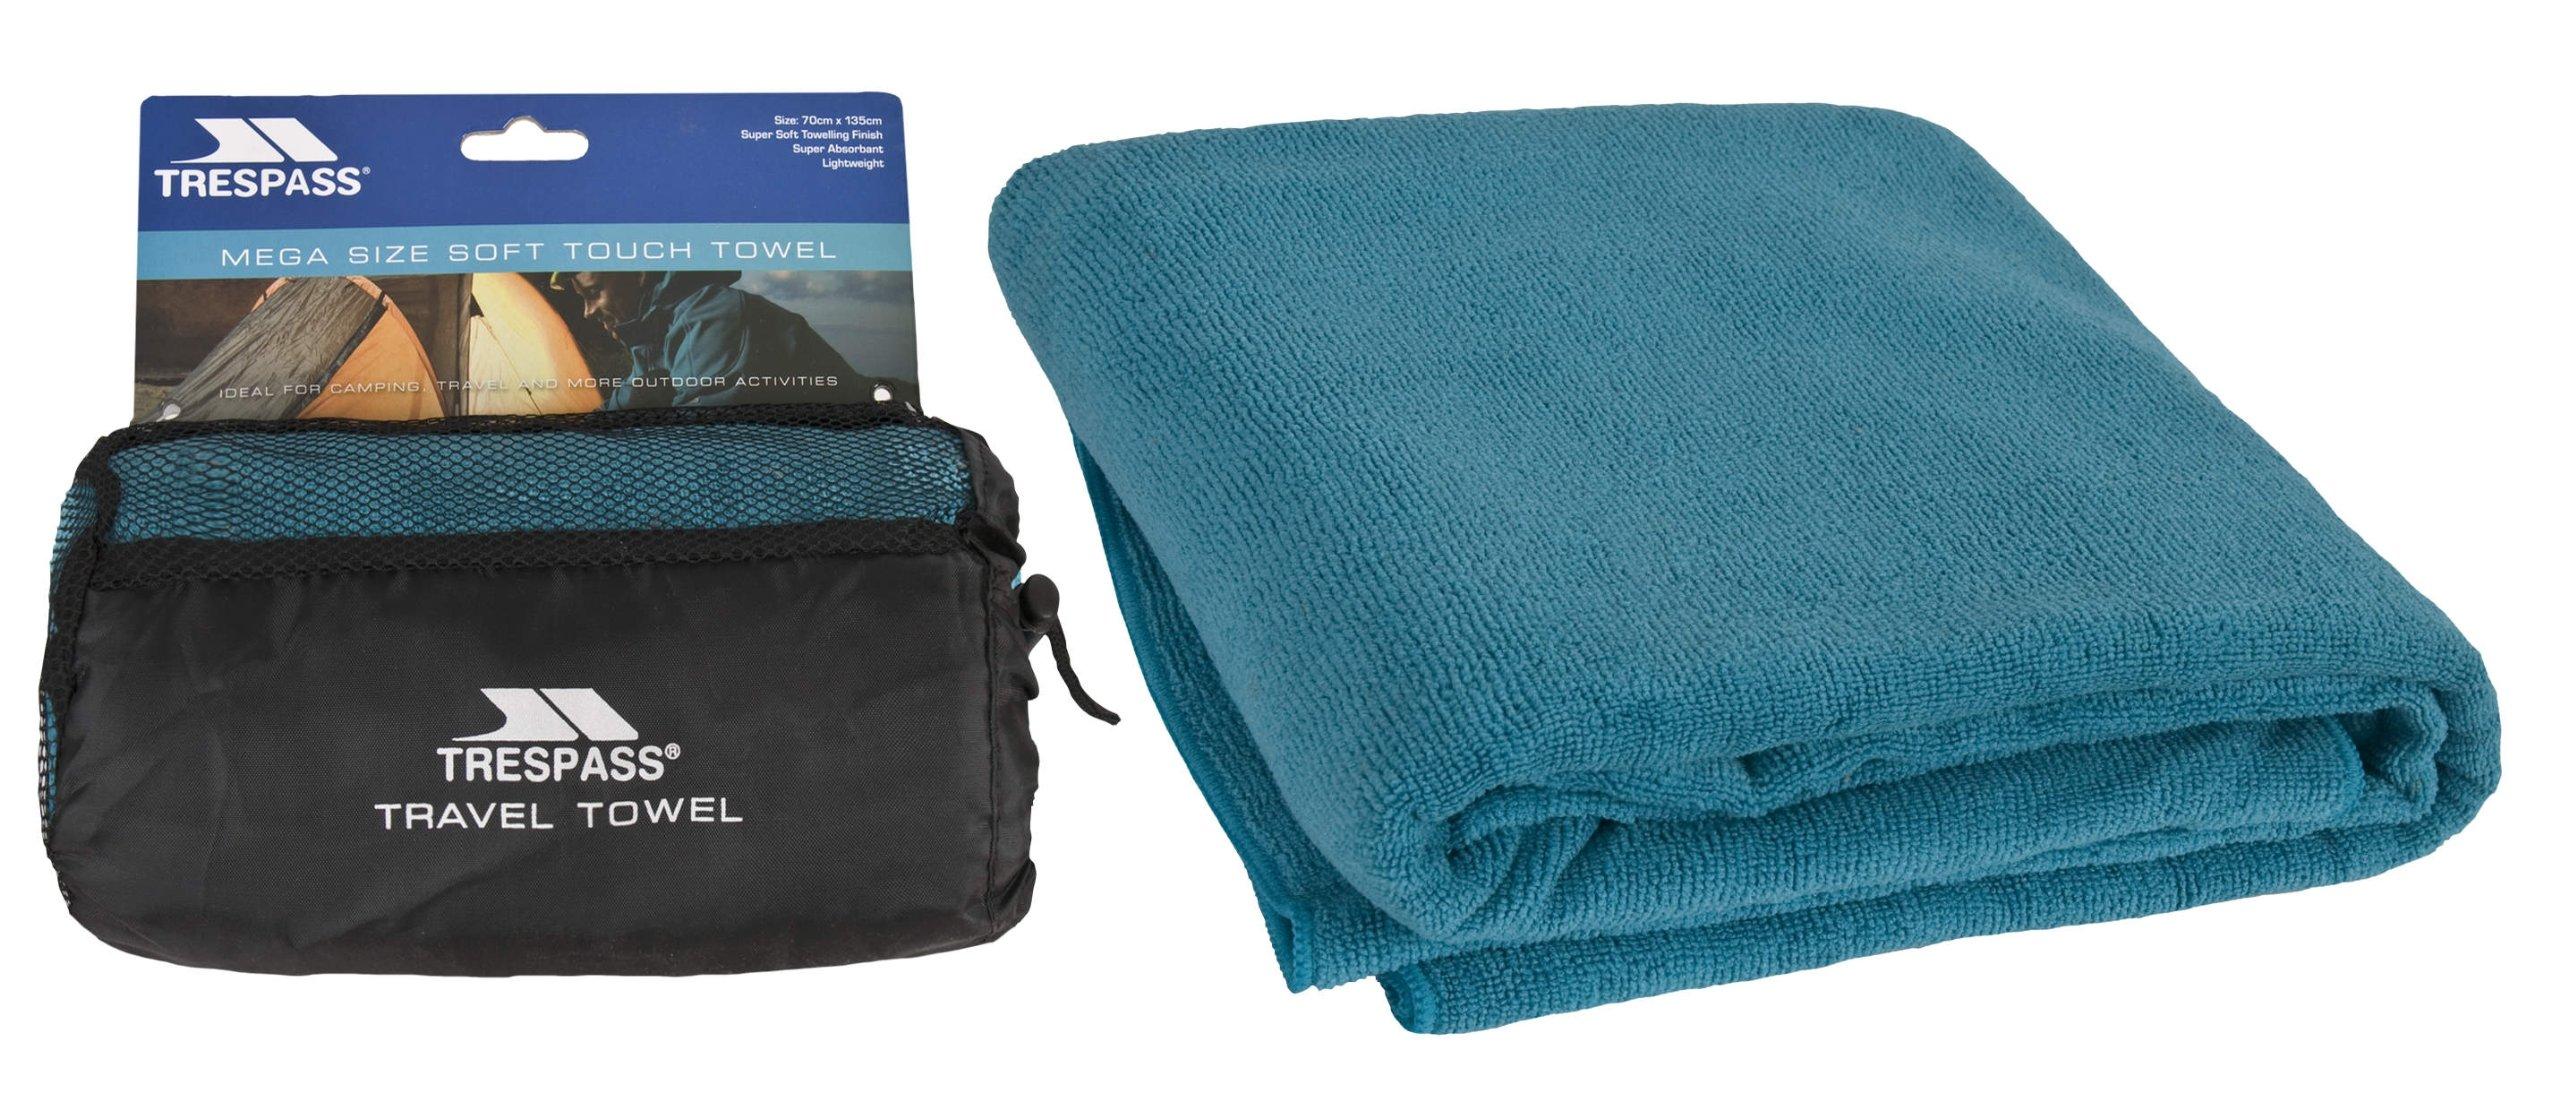 Trespass Wringin Toalla, Unisex Adulto, Azul, 70 x 135 cm product image